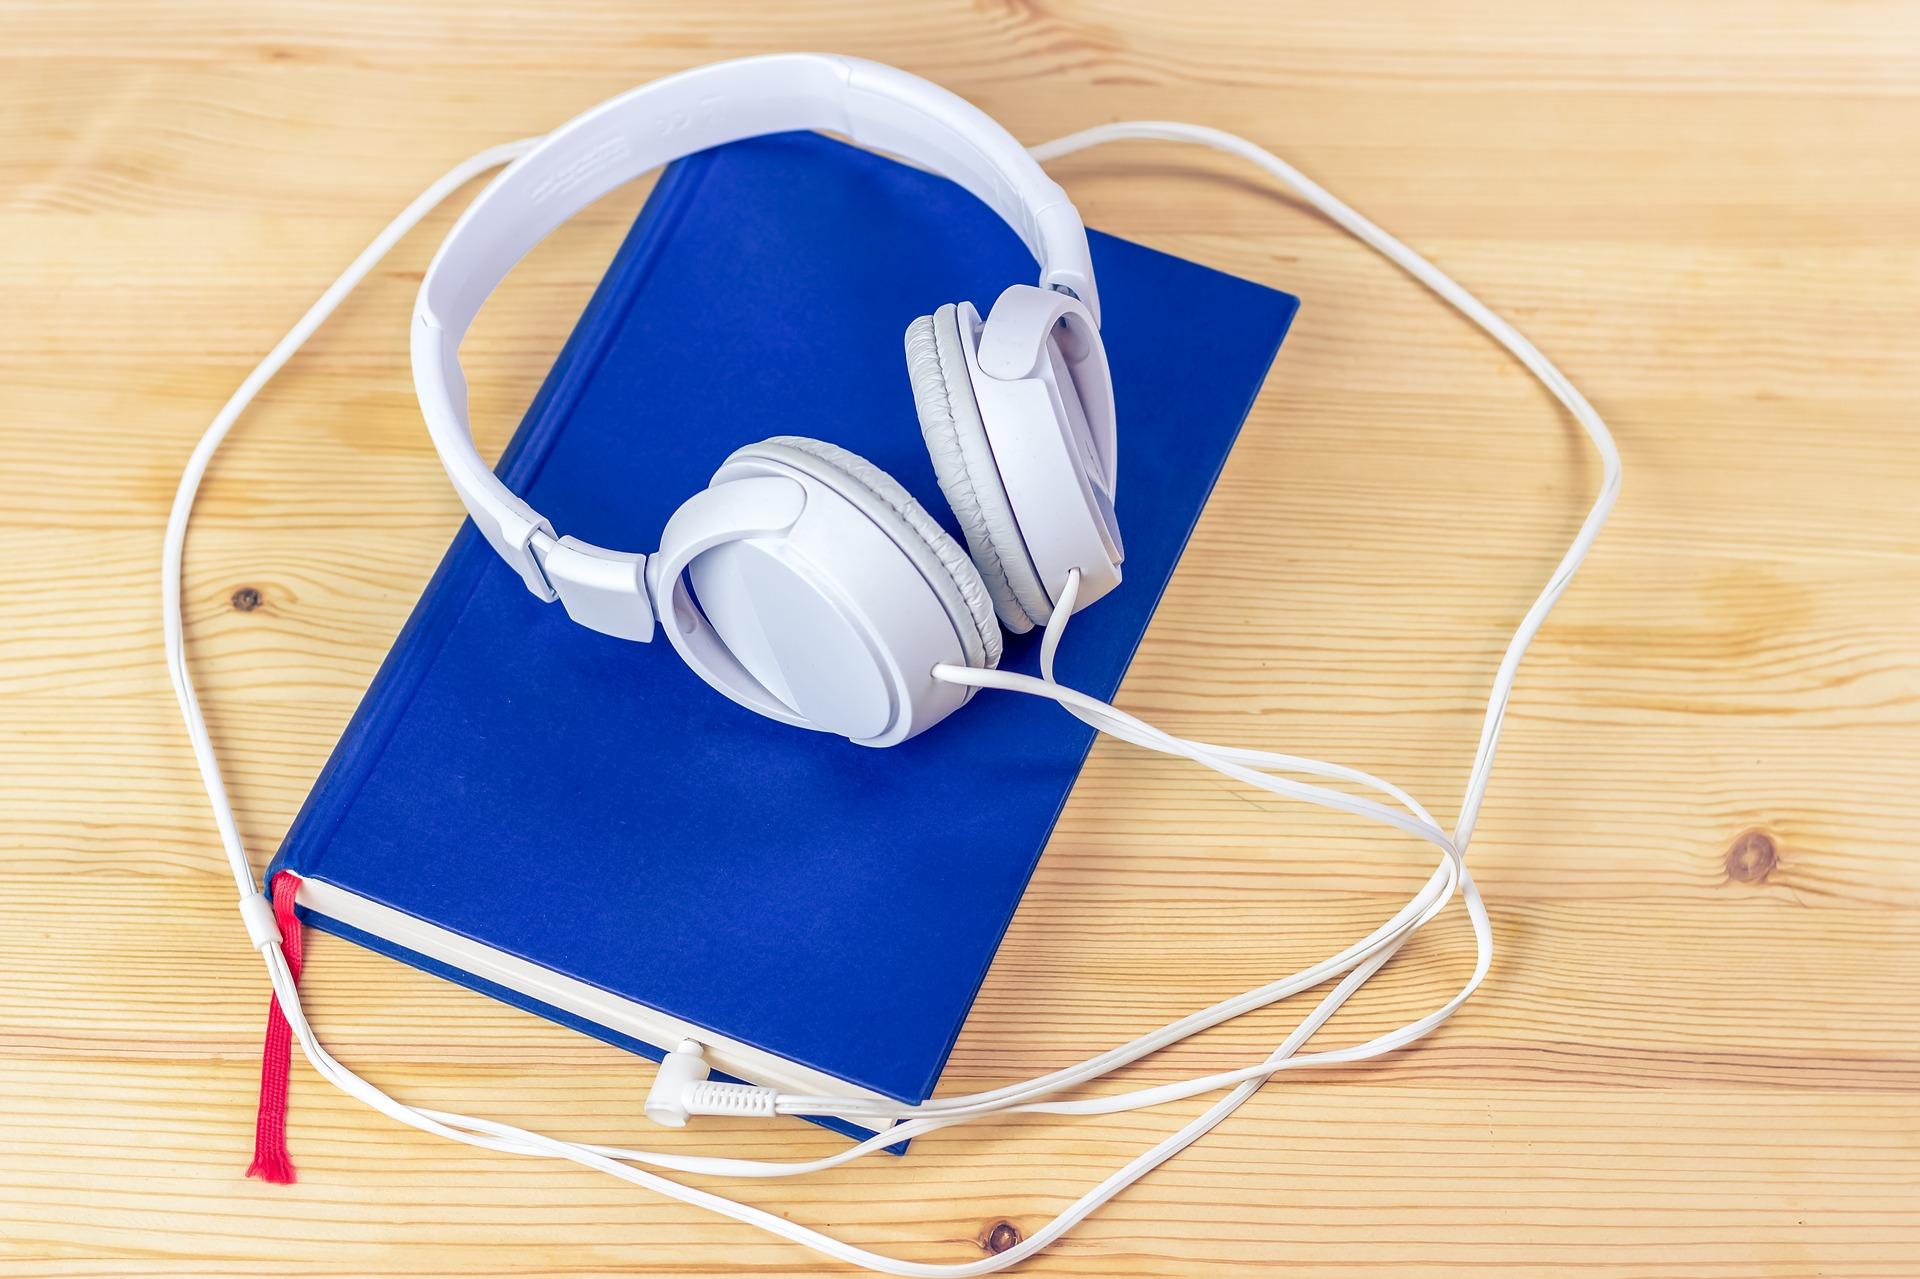 audiobook-3106985_1920